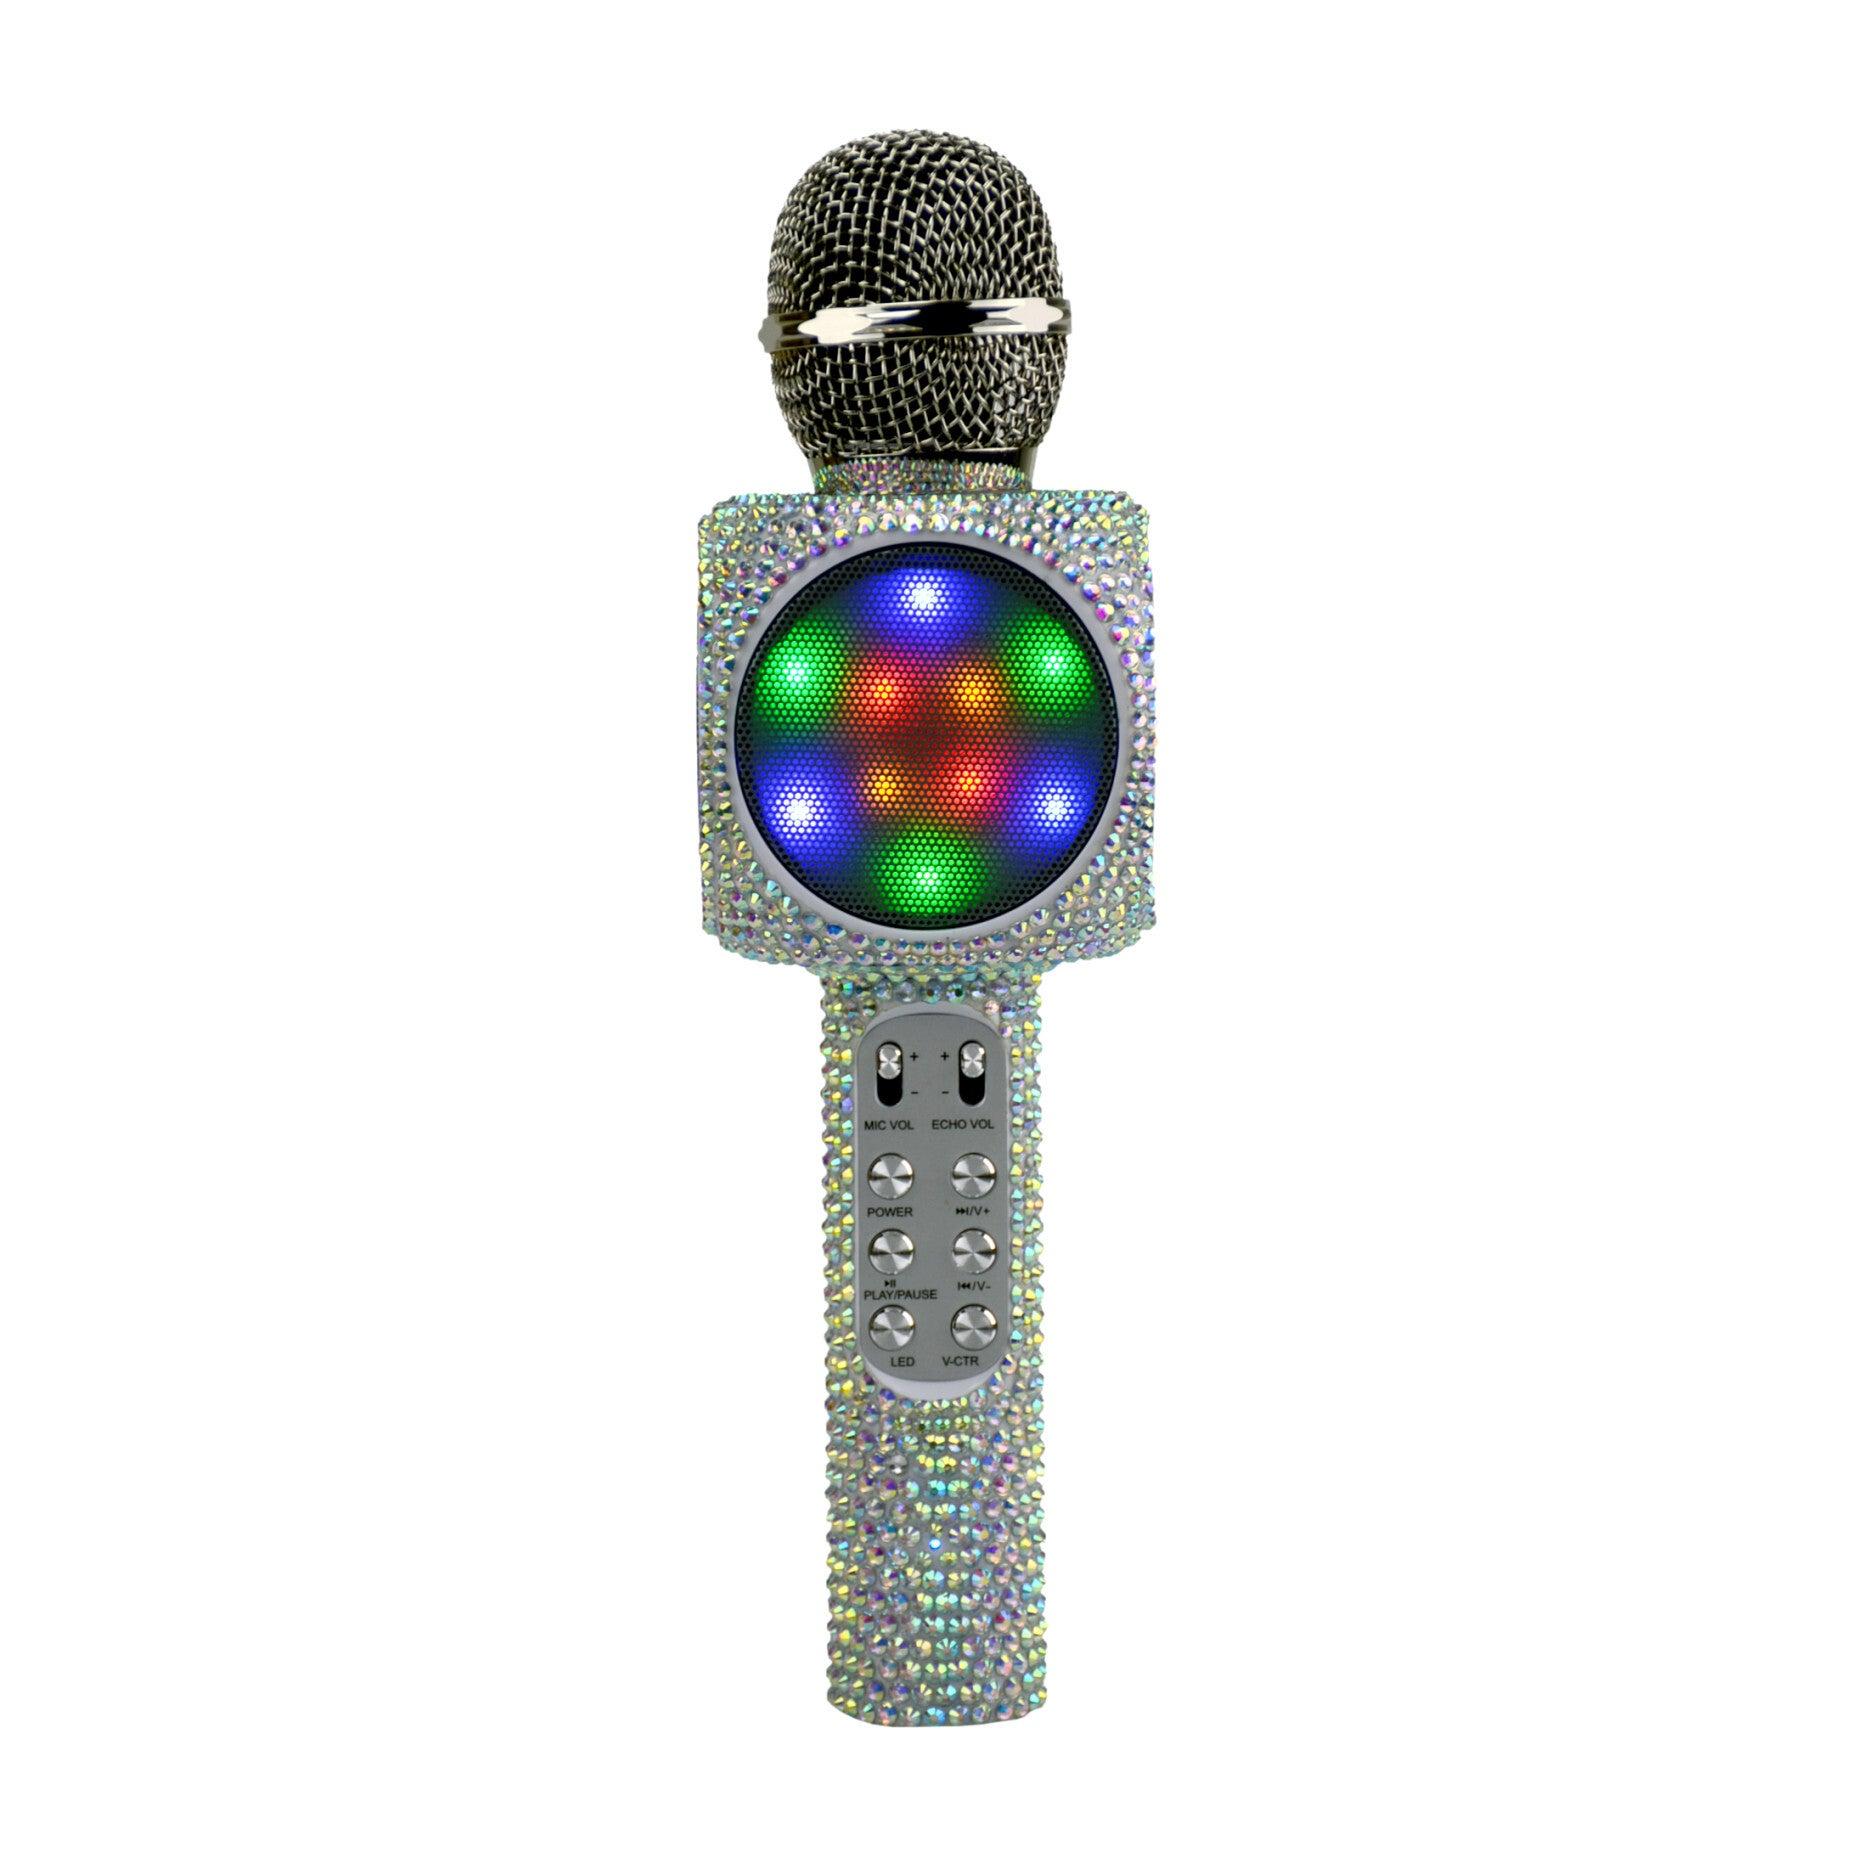 Sing-along Bling Bluetooth Karaoke Microphone, Iridescent